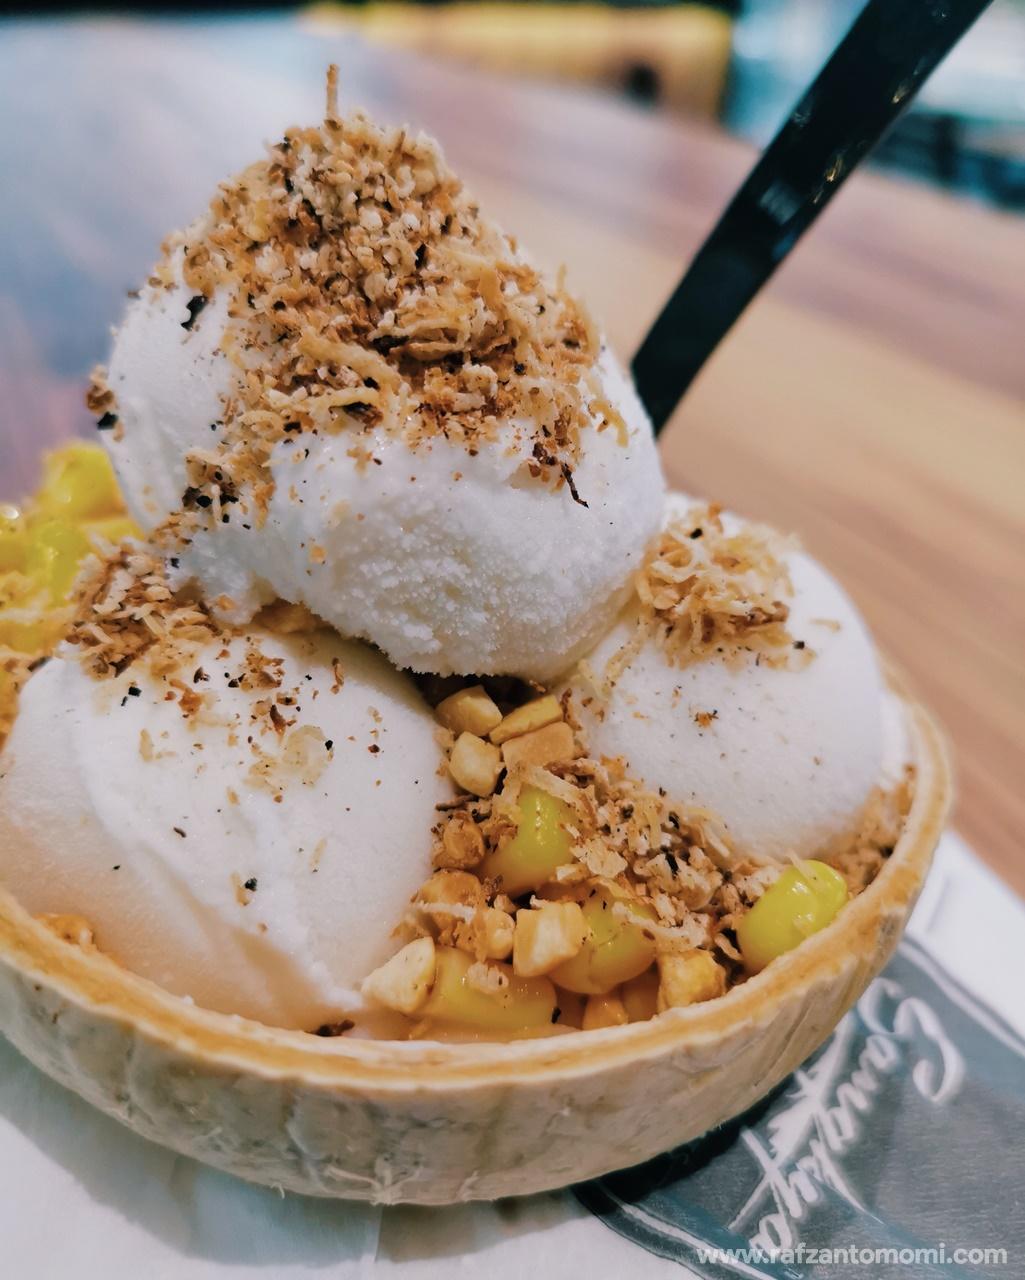 Coconut Durian Ice Cream, Sangkaya - Cuba Try Test Tengok